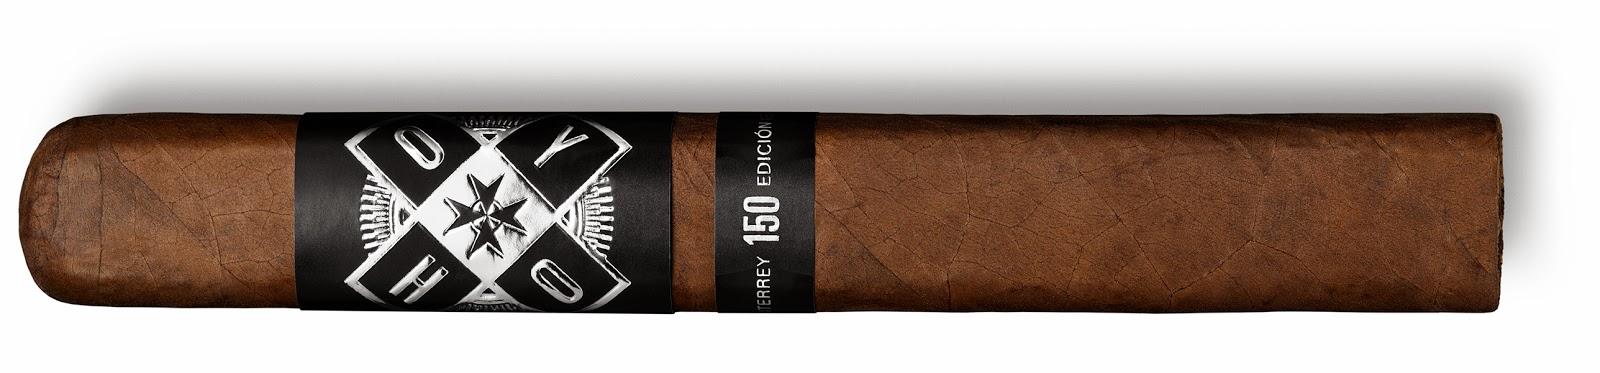 Hoyo_de_Monterrey_Edicion_de_Cumpleanos_150_cigar